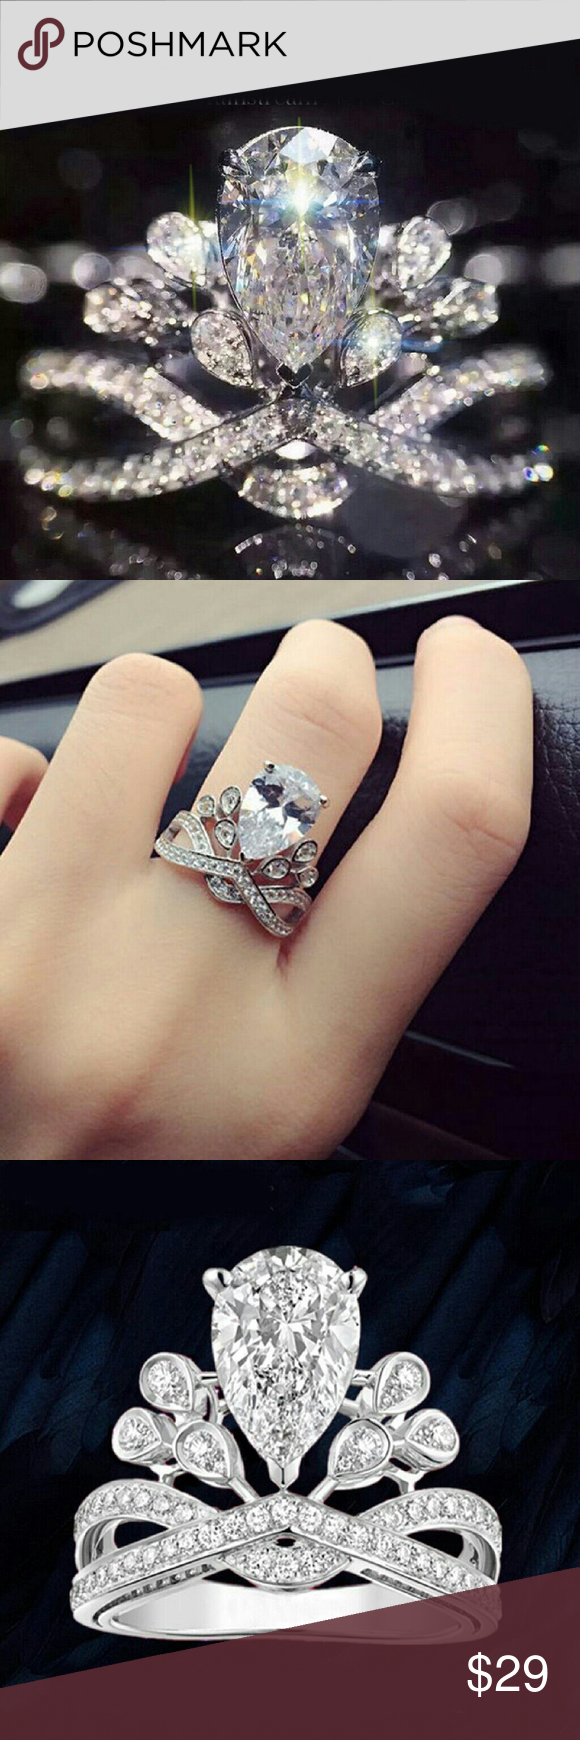 princess🌸crown ring nwt White topaz rings, Silver topaz